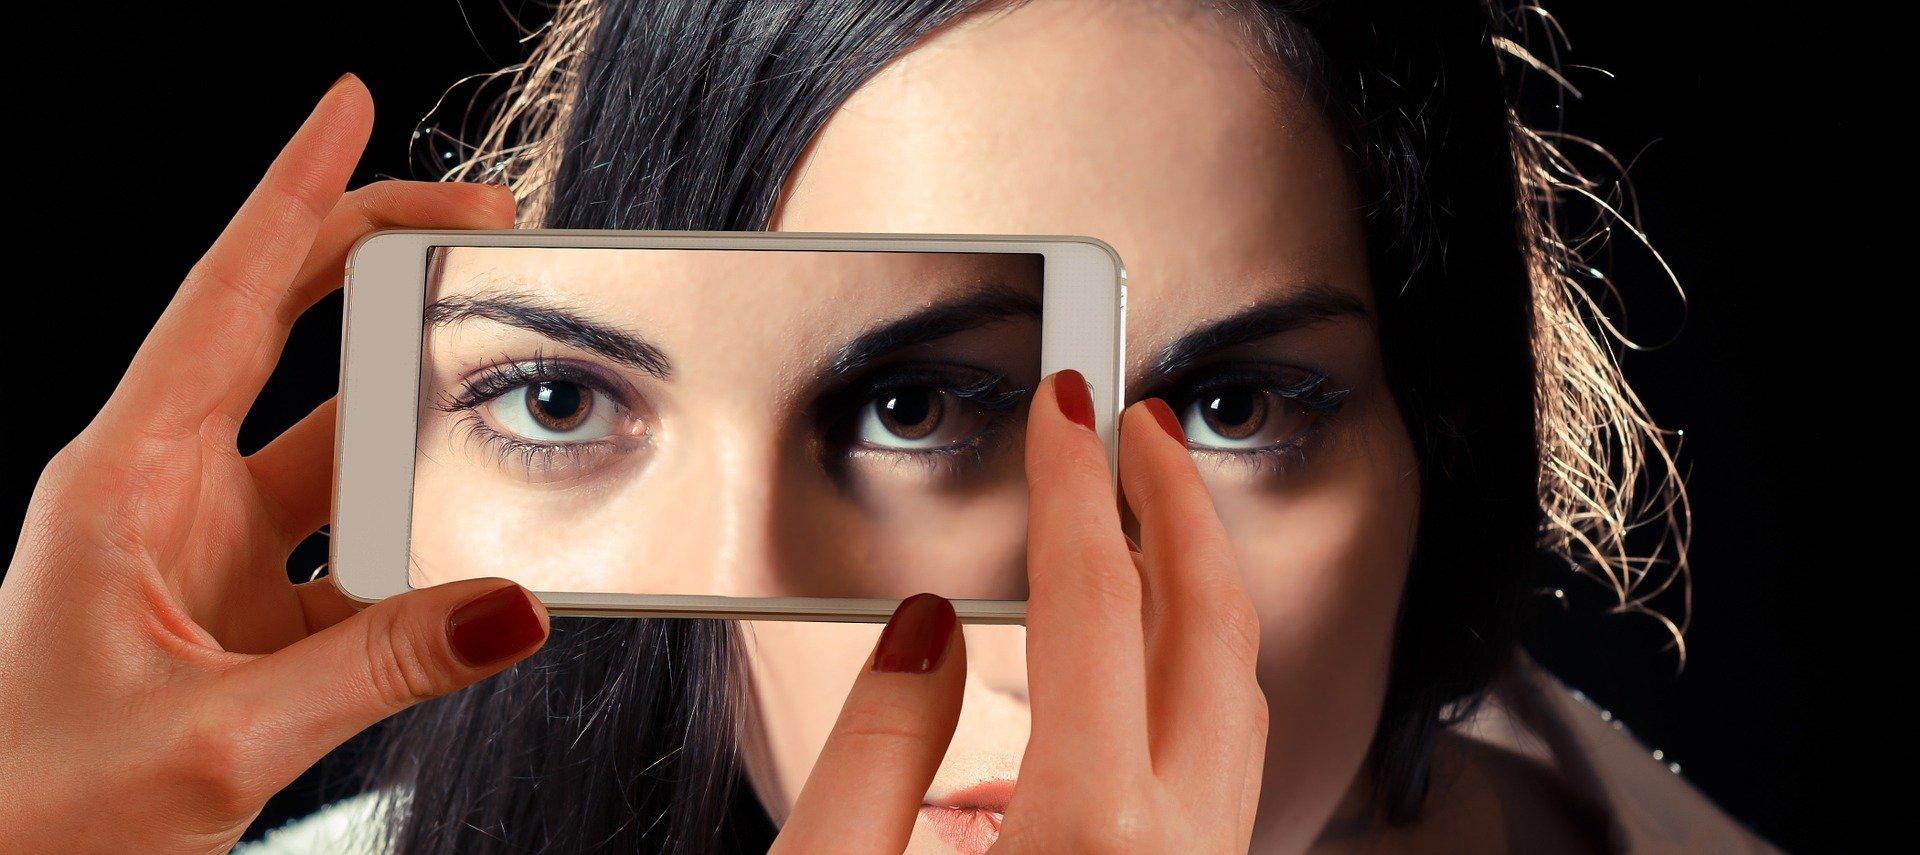 Digital life - smartphone